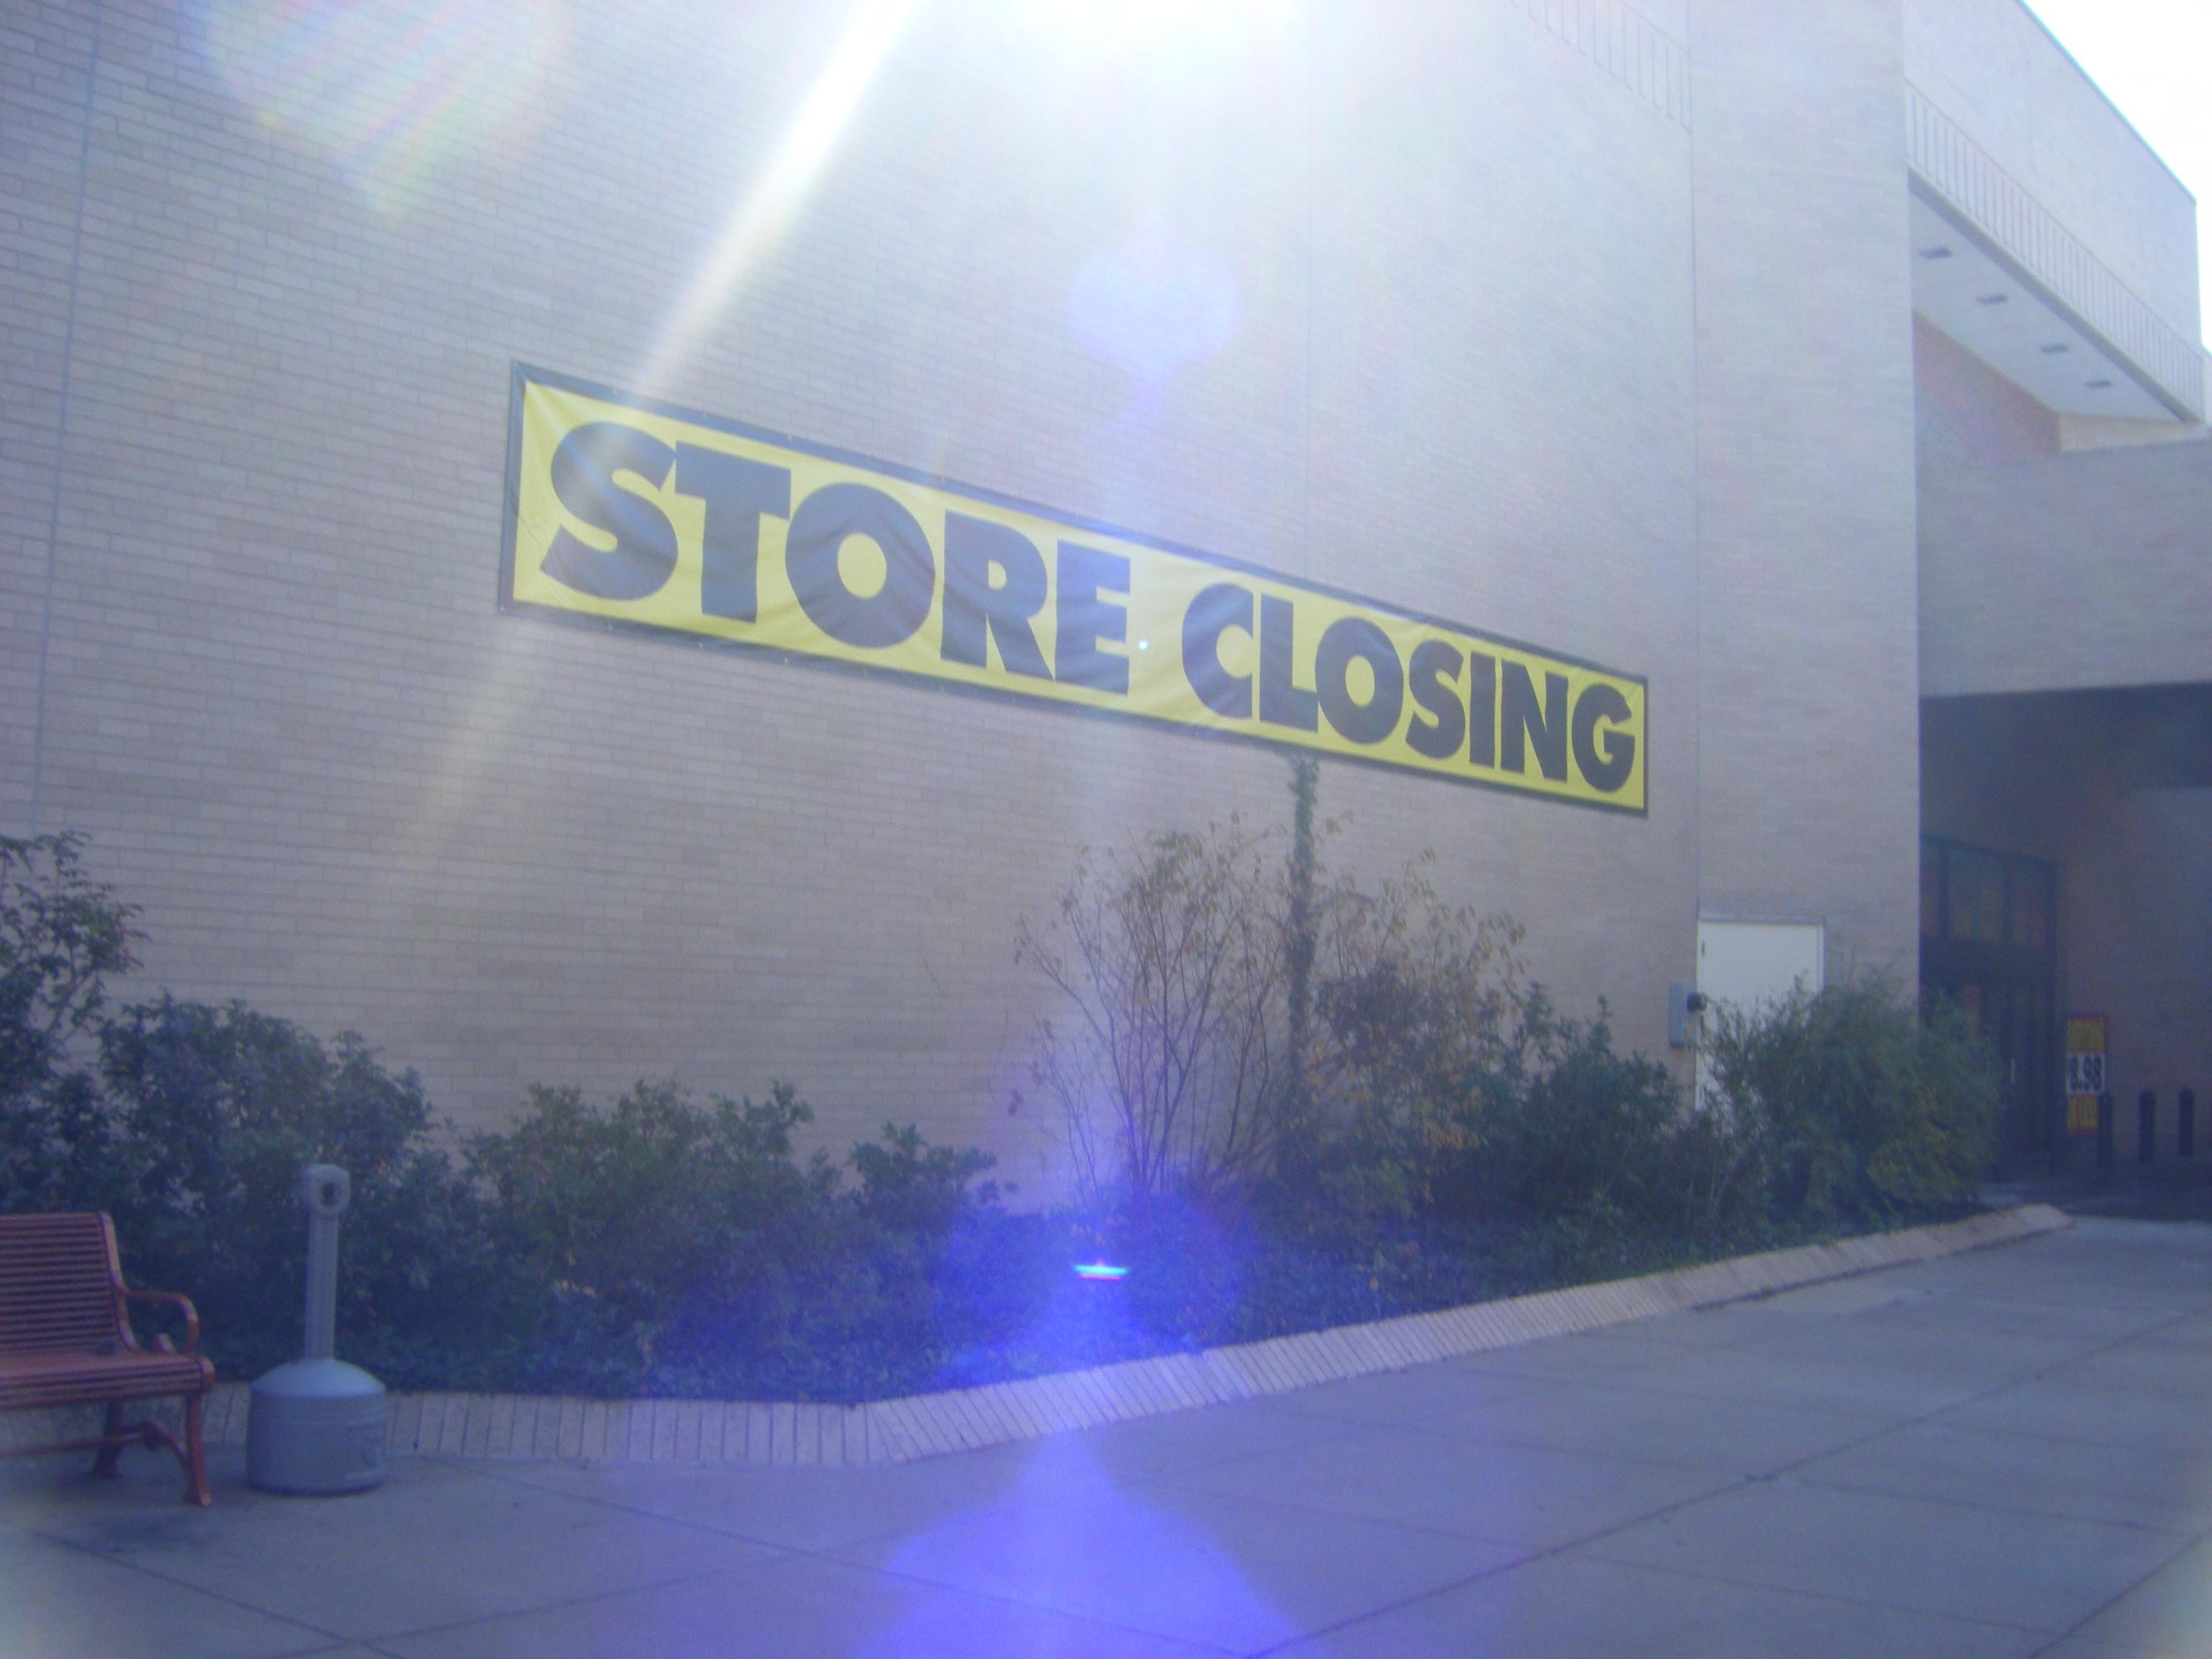 filestore closing banner sampb southwest plazajpg